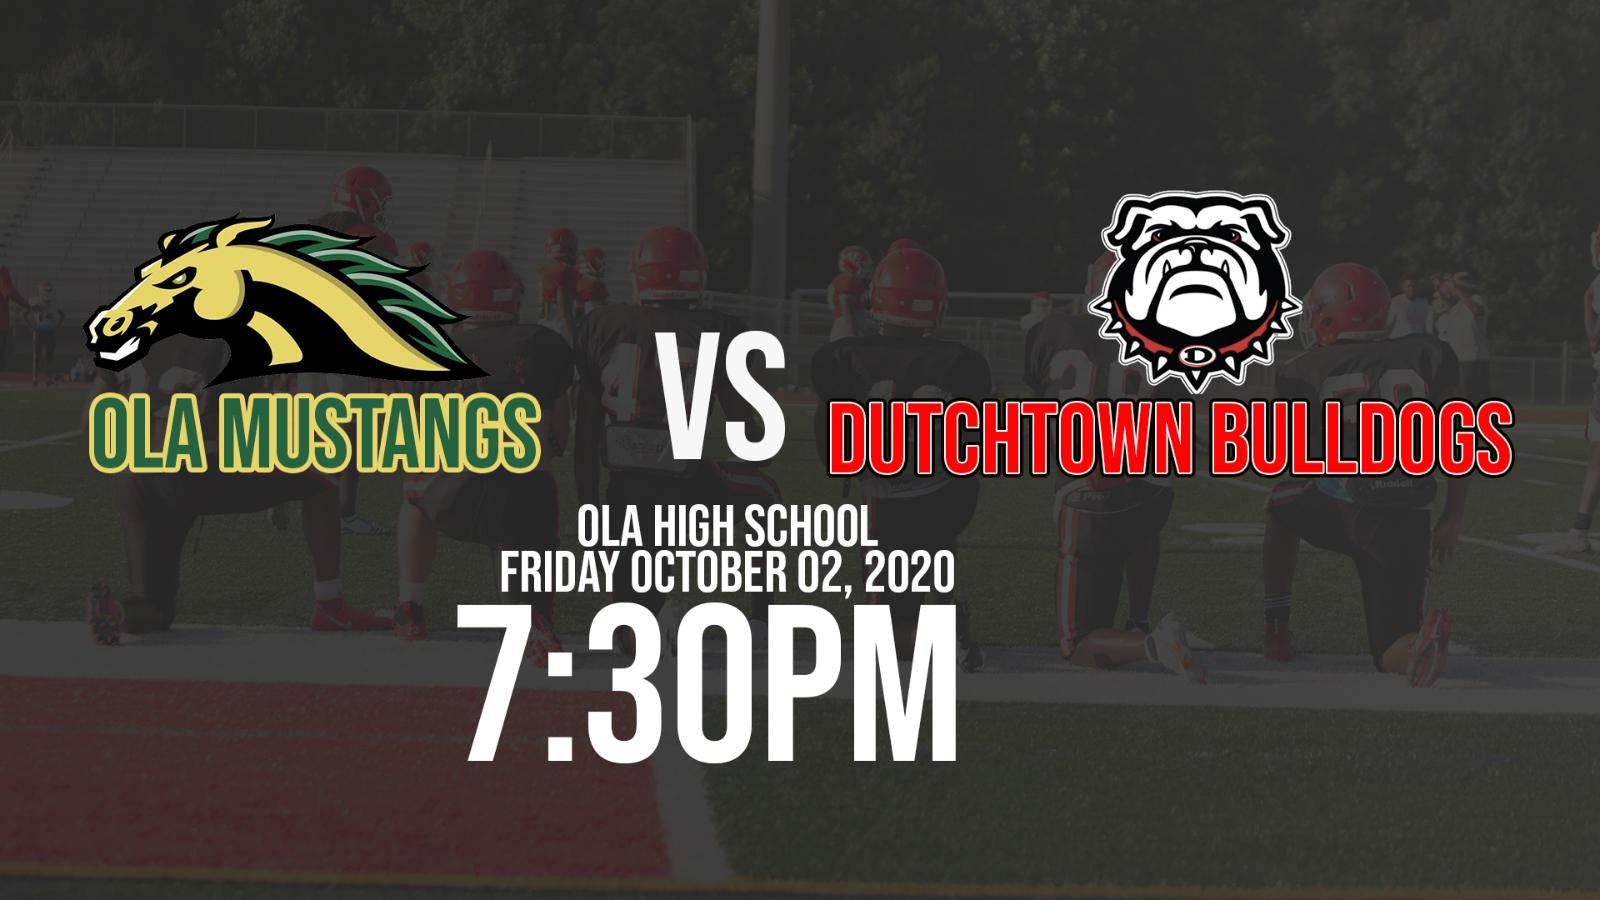 Dutchtown Bulldogs @ Ola Mustangs October 02, 2020